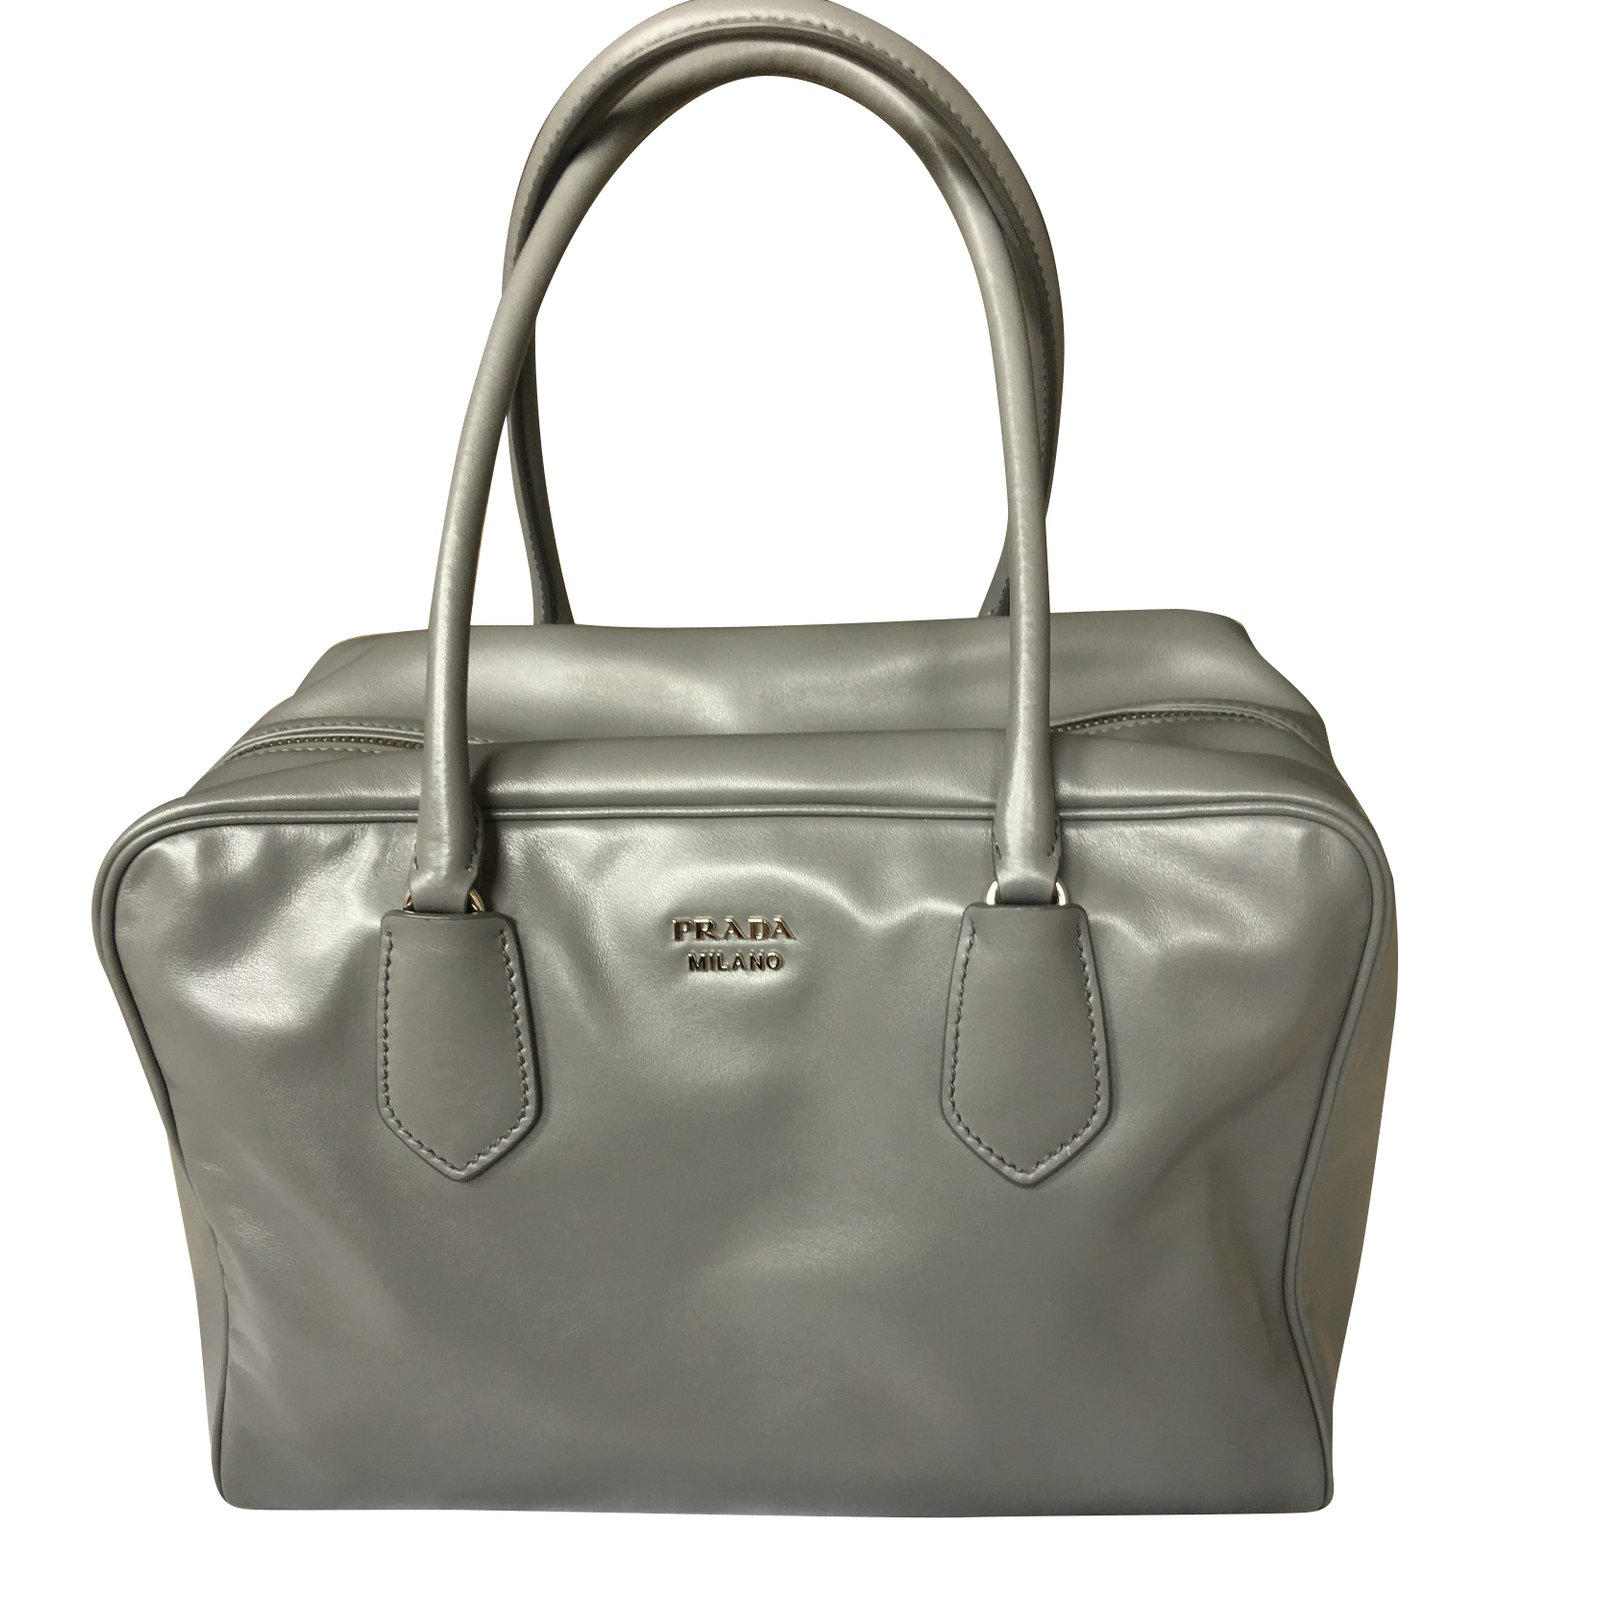 Prada catwalk model 'Inside' bag brand new! cost £ 2395